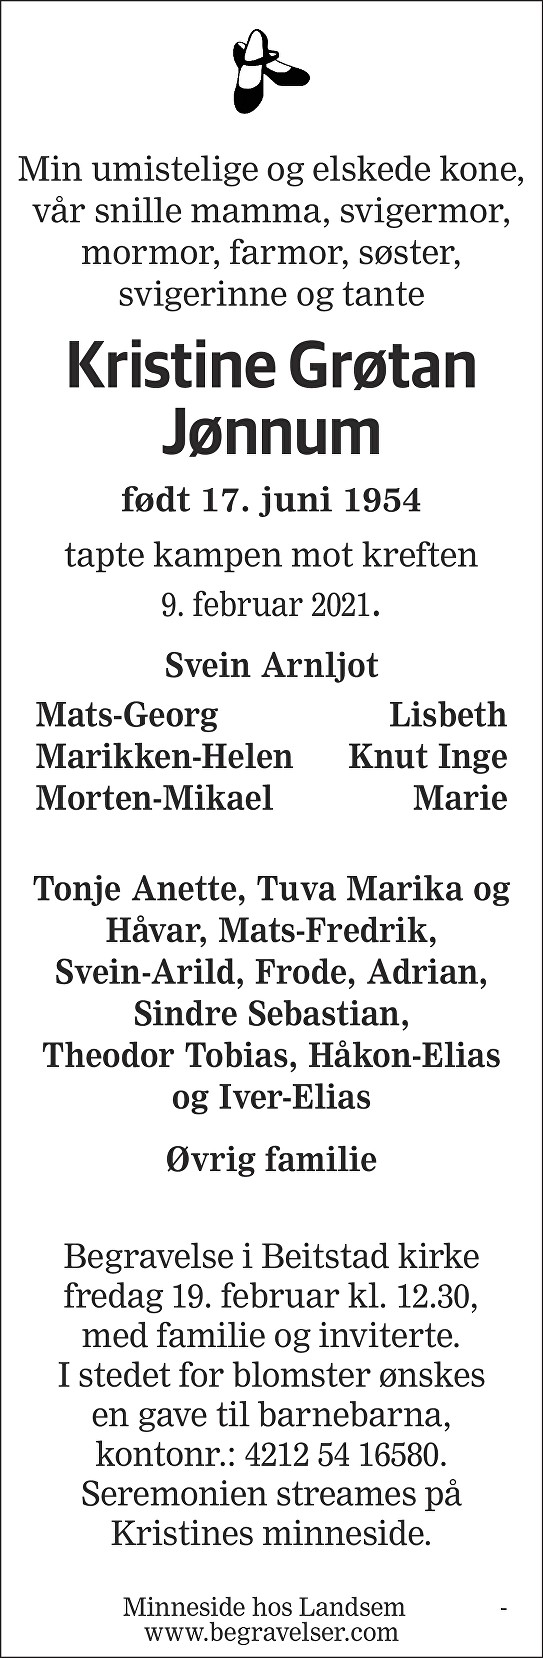 Kristine Grøtan Jønnum Dødsannonse